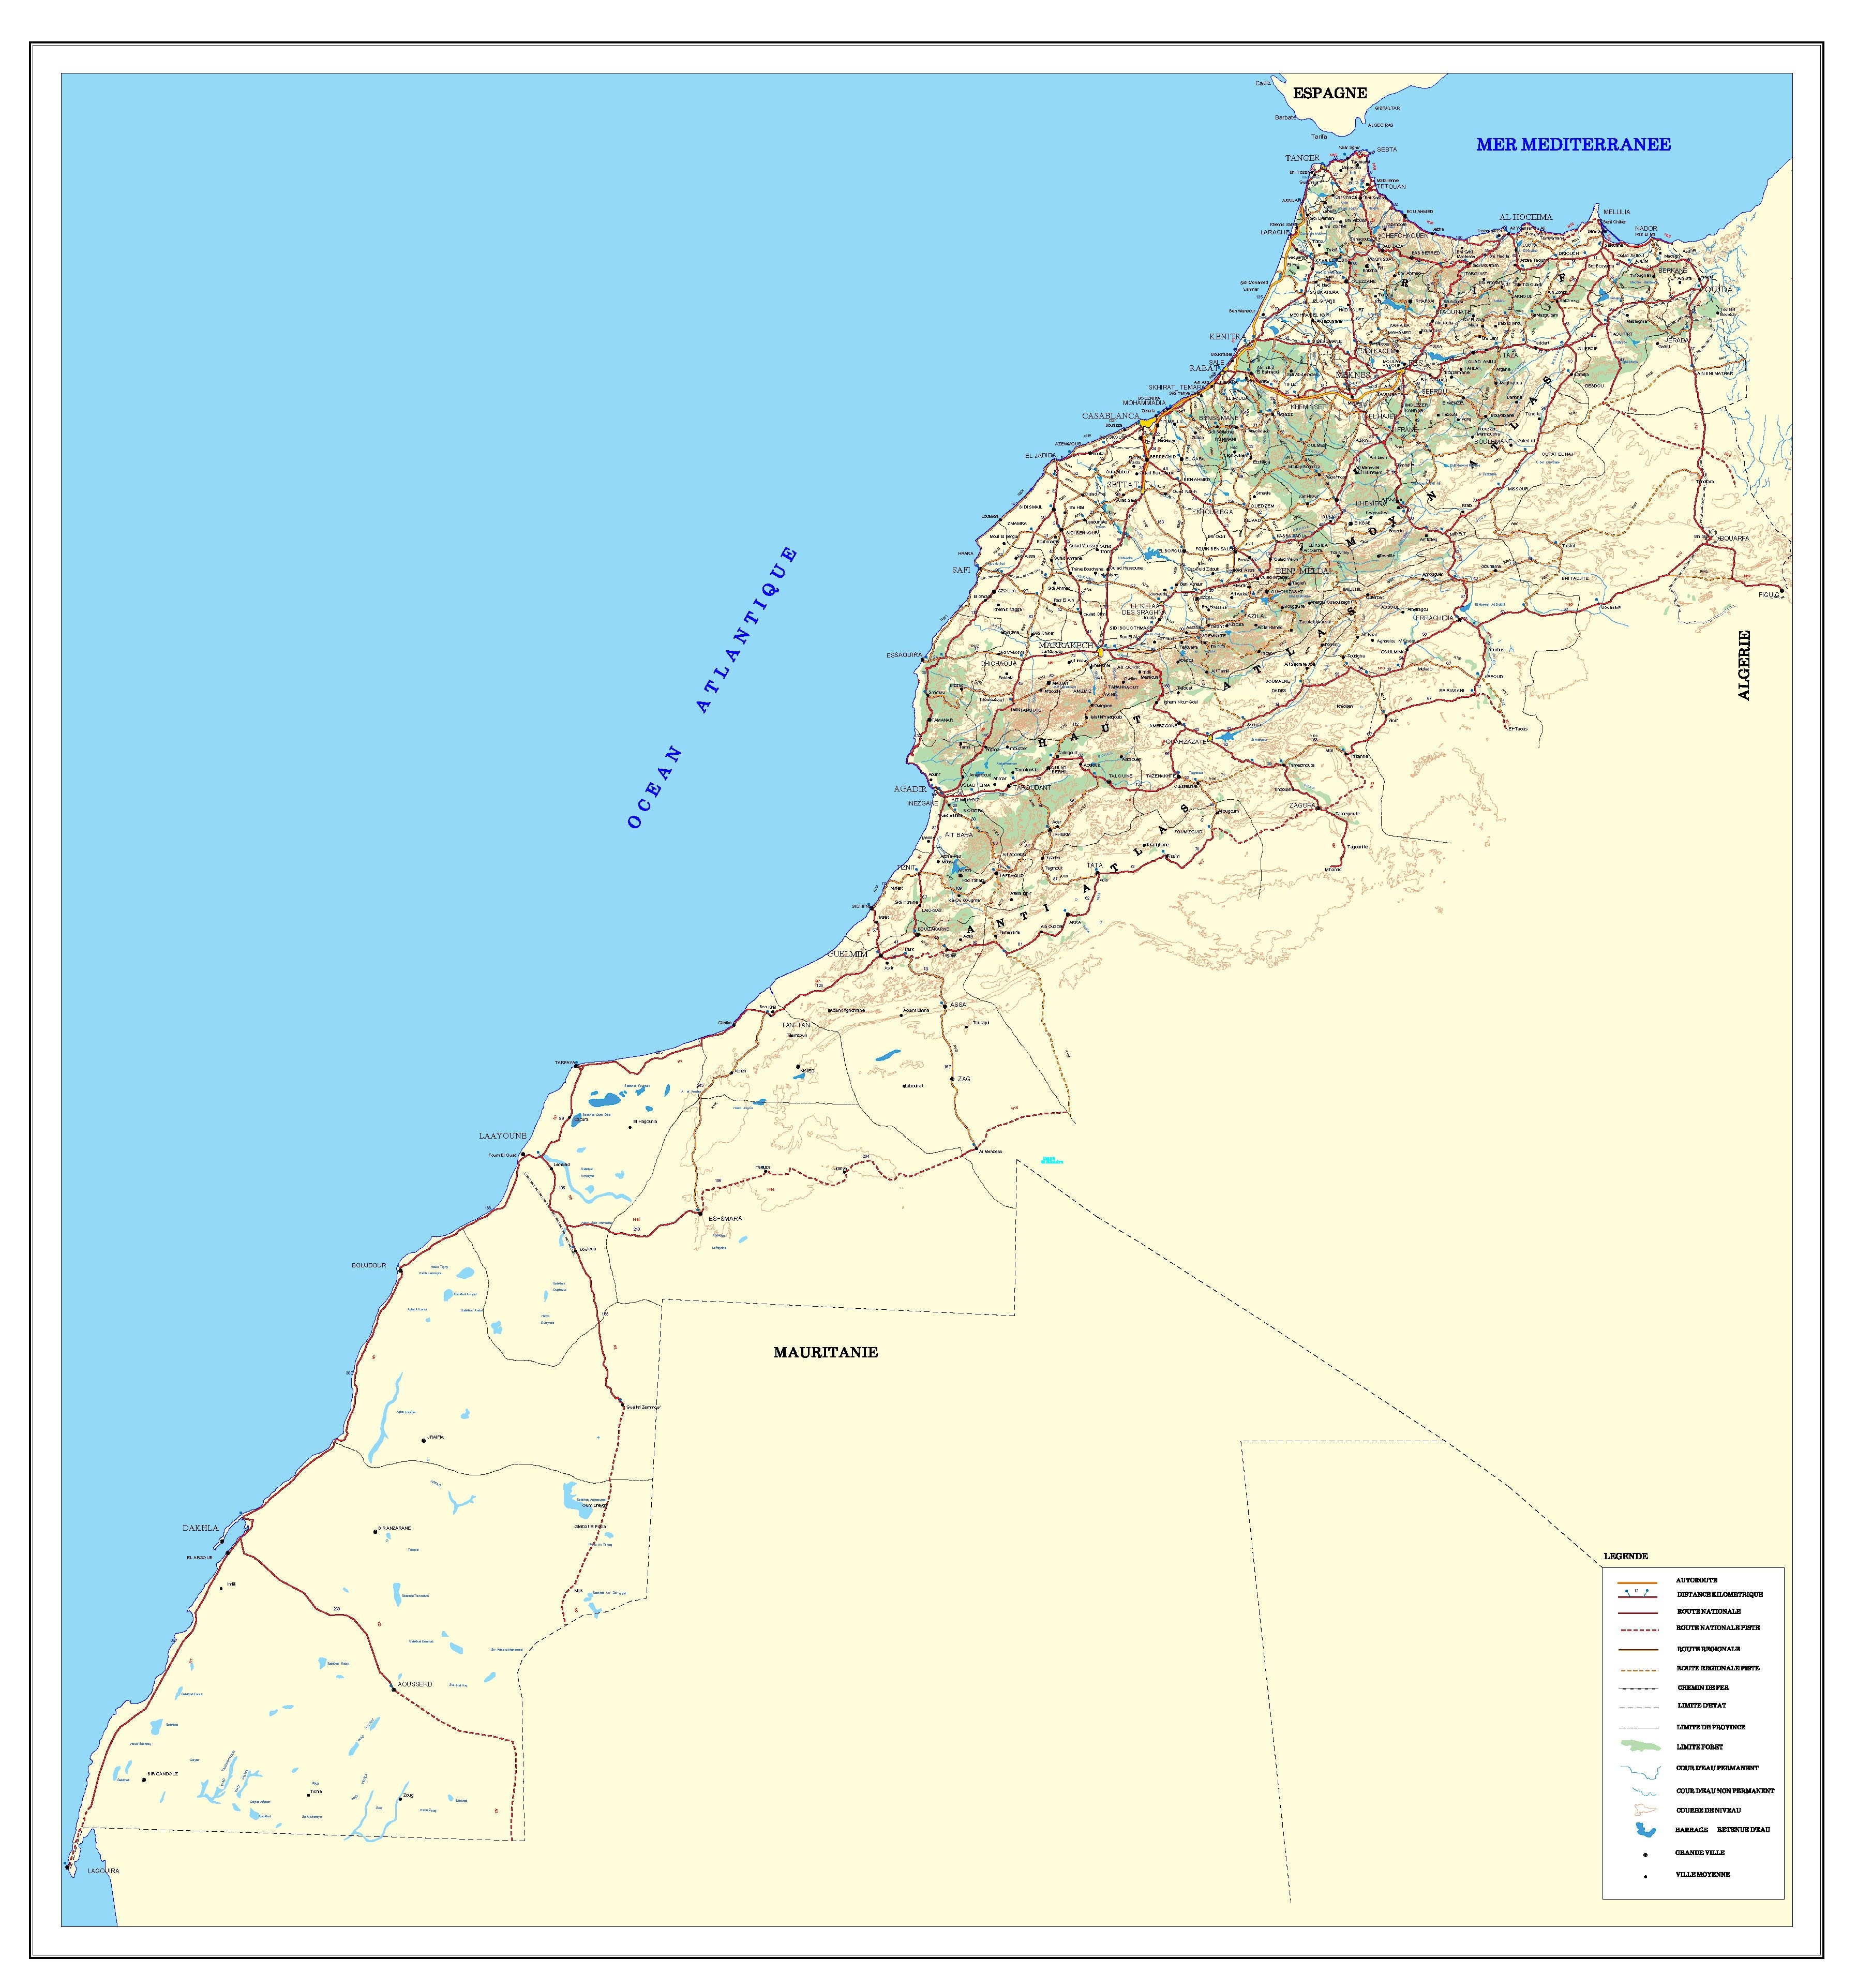 Mapa de carreteras de Marruecos